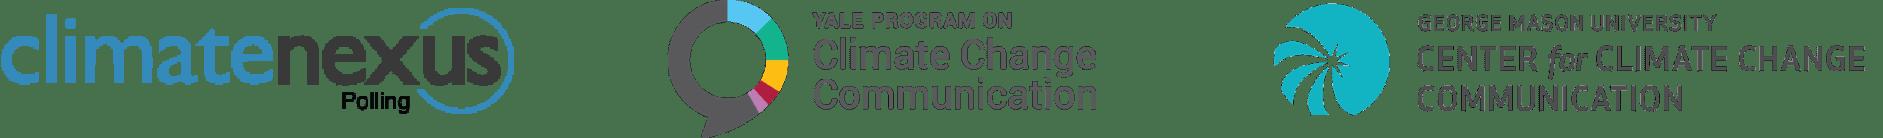 Climate Change Polling, Toplines & Data | Climate Nexus